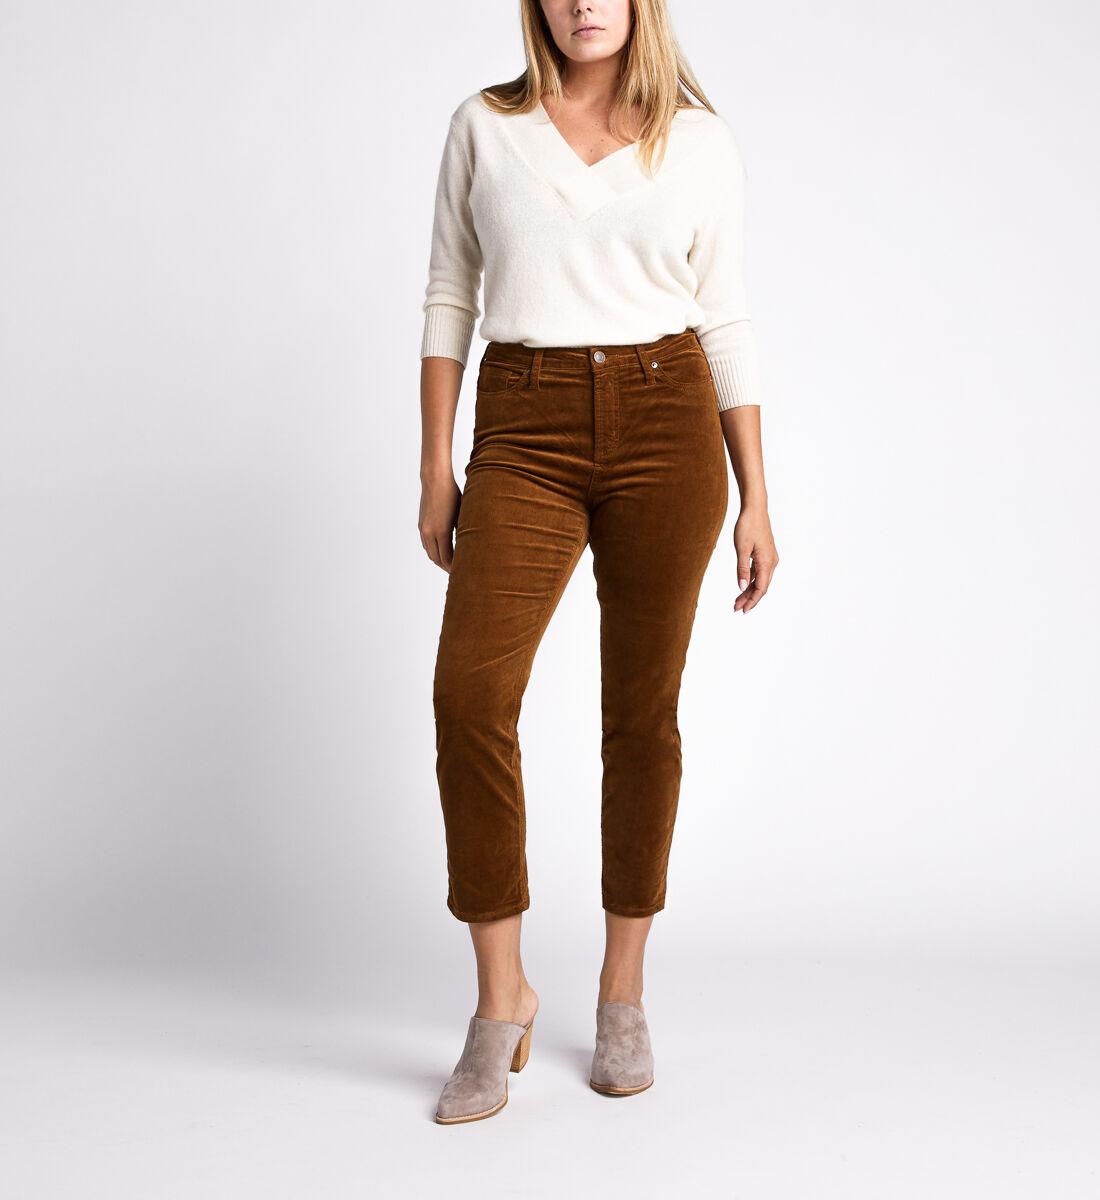 High Note High Rise Slim Leg Pants,Caramel Alt Image 1